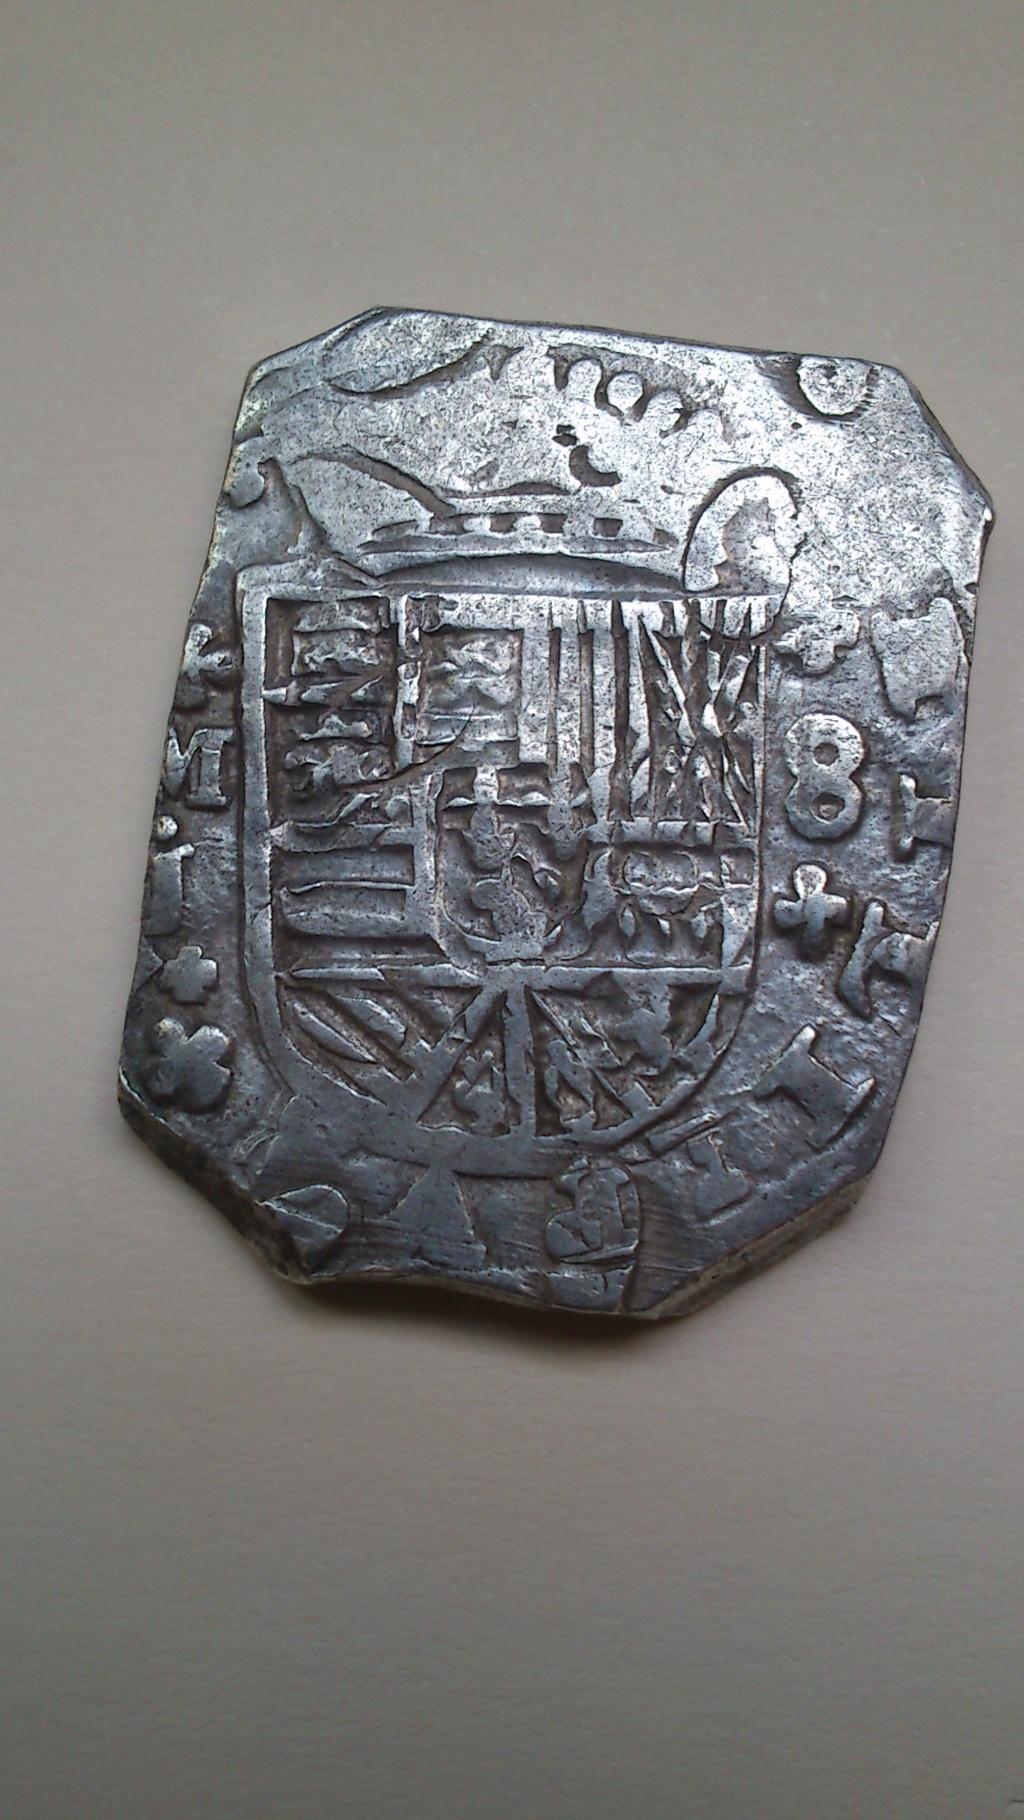 8 REALES FELIPE V 1709 CECA DE MADRID (tipo macuquina) Dsc_0050